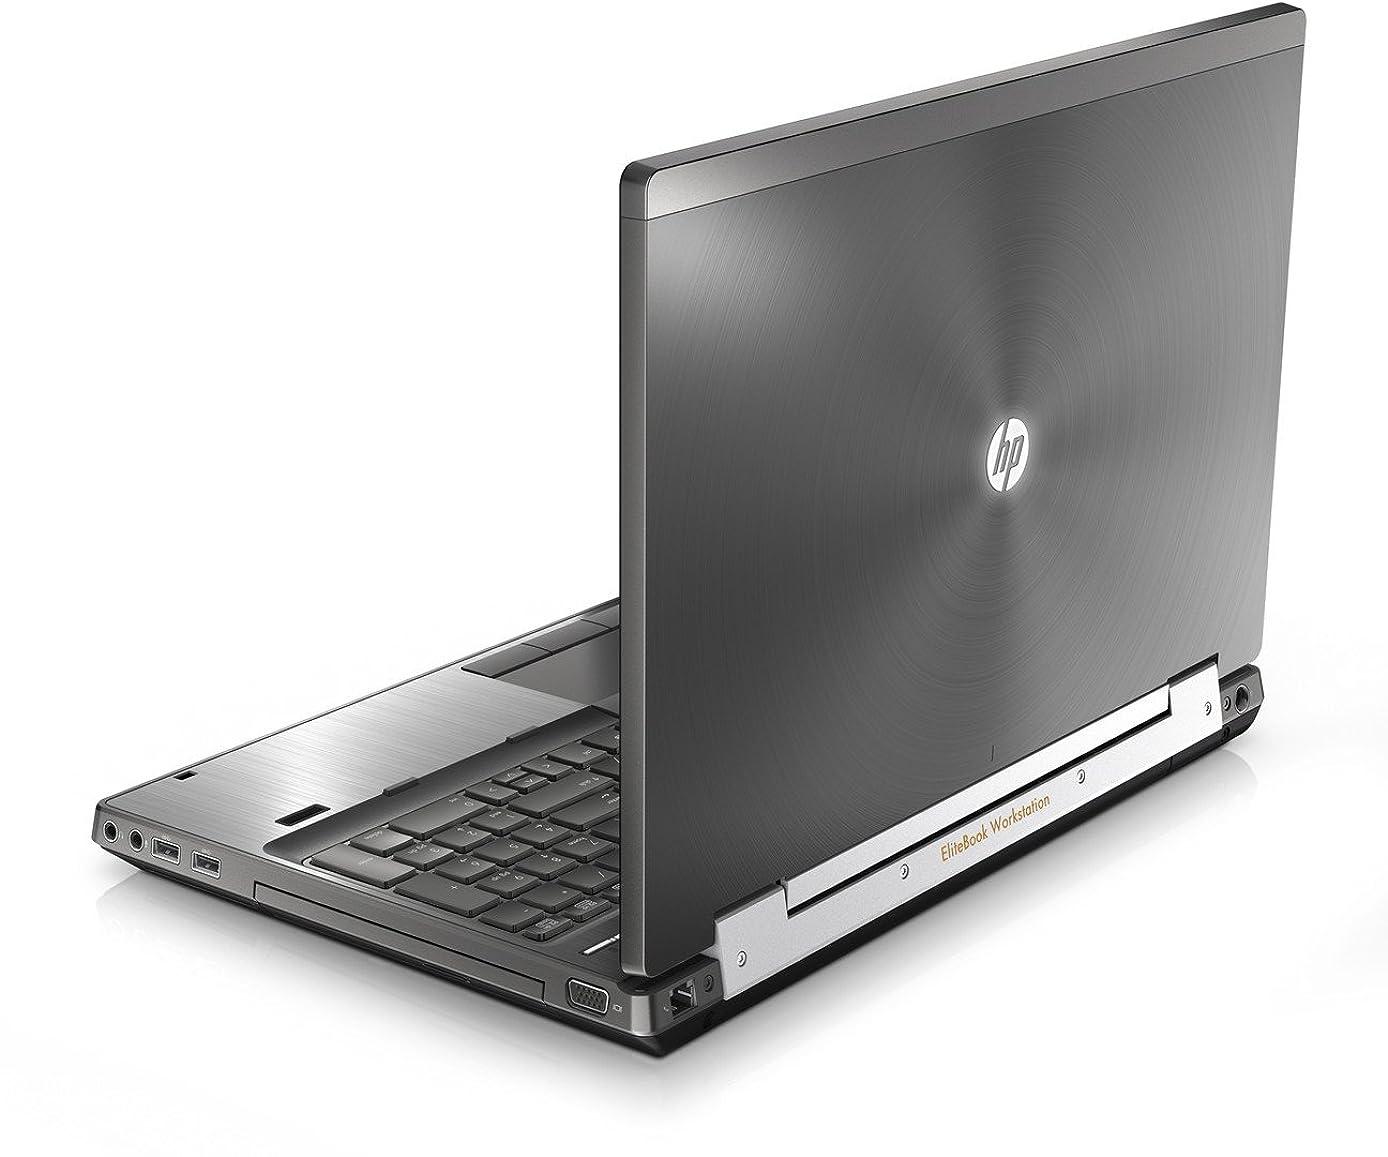 HP Elitebook 8570W 15in Notebook PC - Intel Core i5-3320M 2.6GHz 8GB 320GB DVDRW Windows 10 Professional (Renewed)